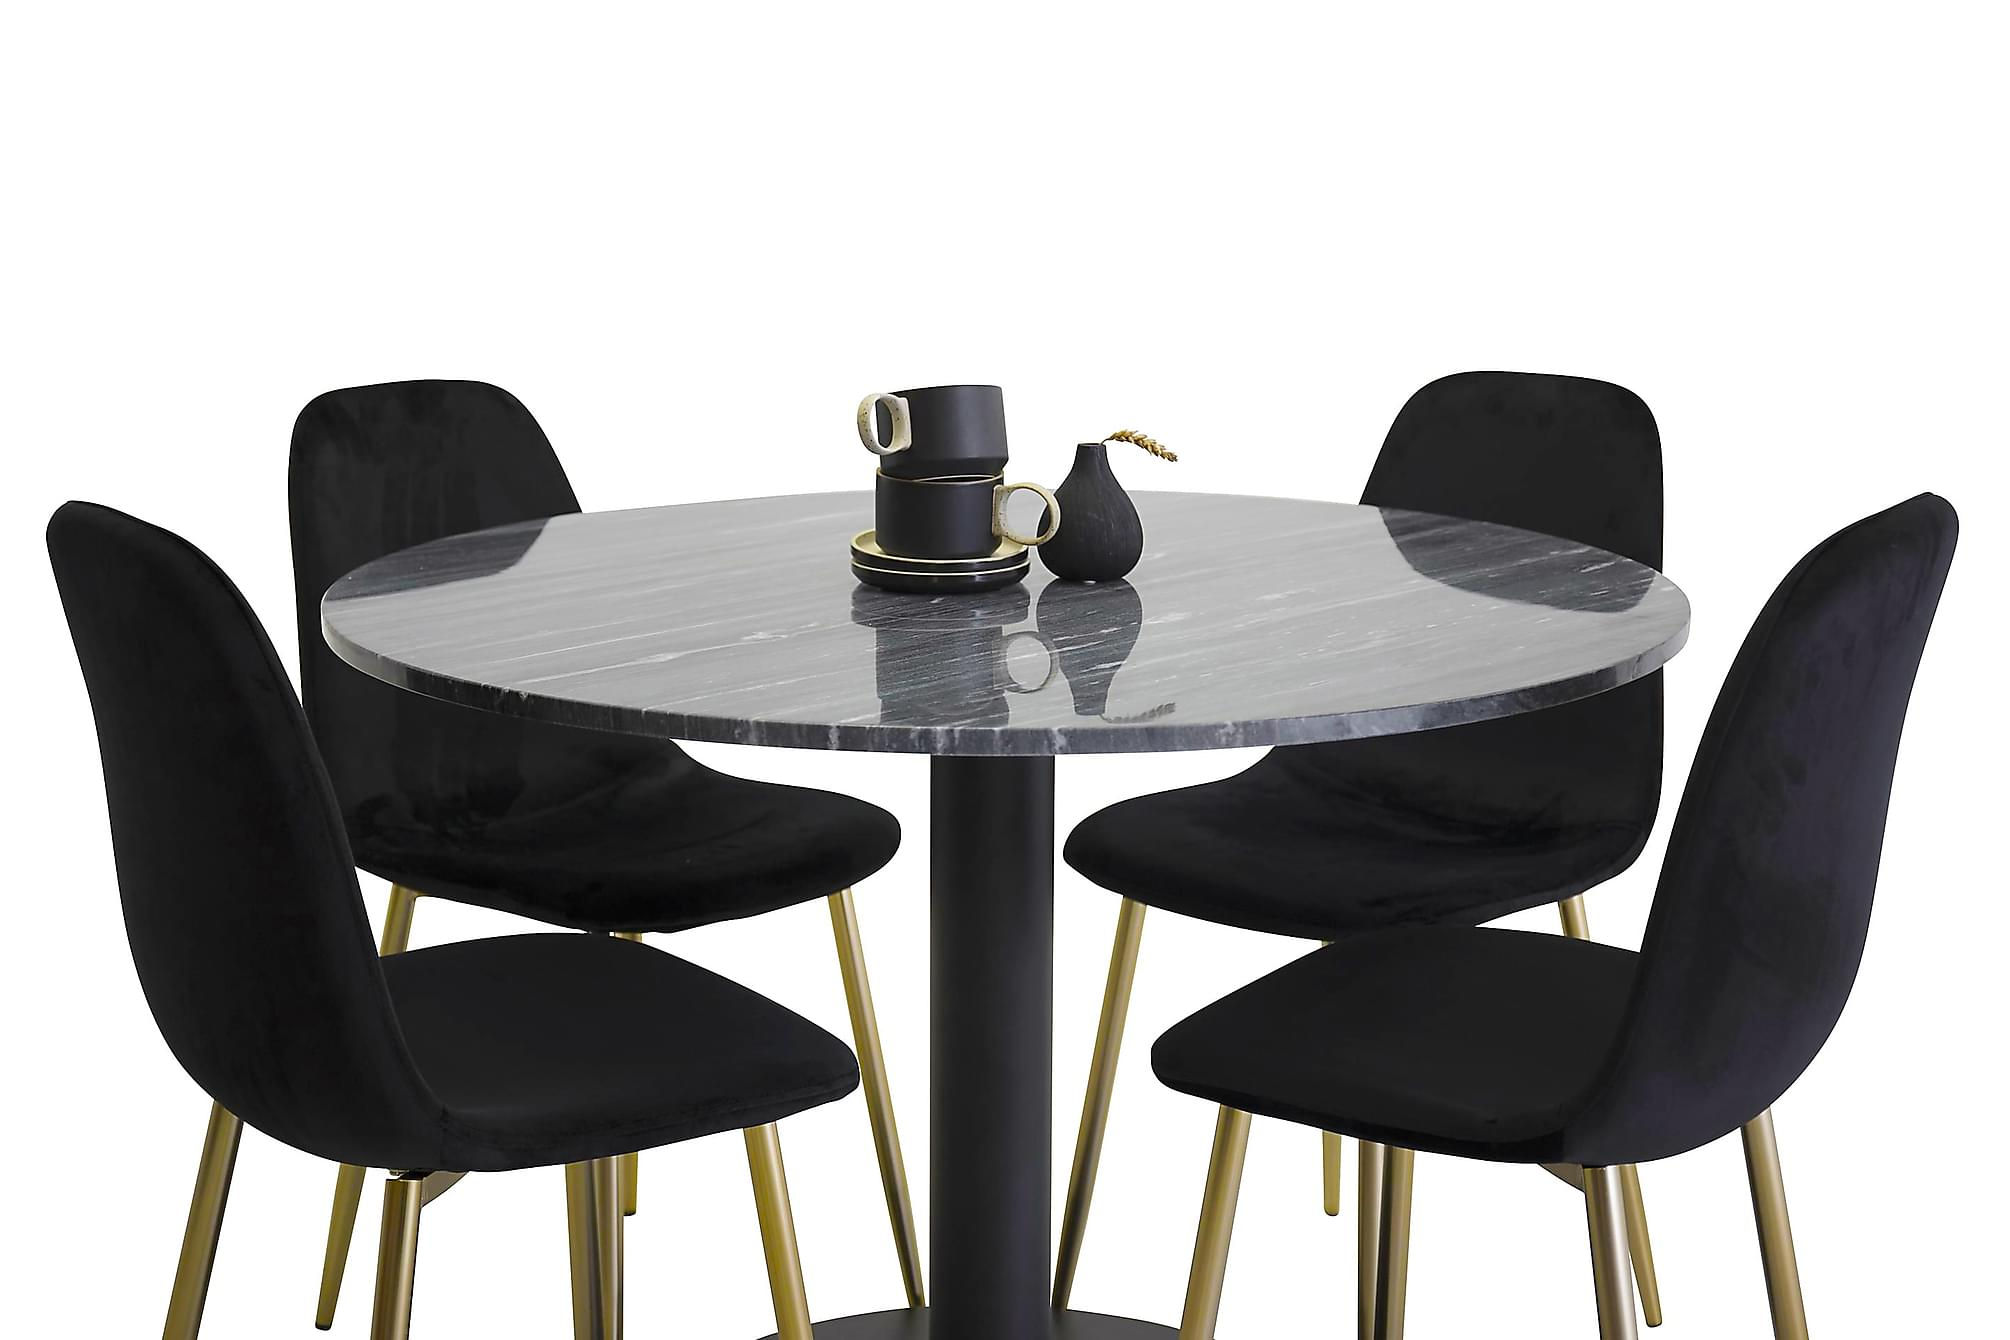 ADMIRA matbord runt svart/svart+Pontus stol svart/mässing 4s, Matgrupper